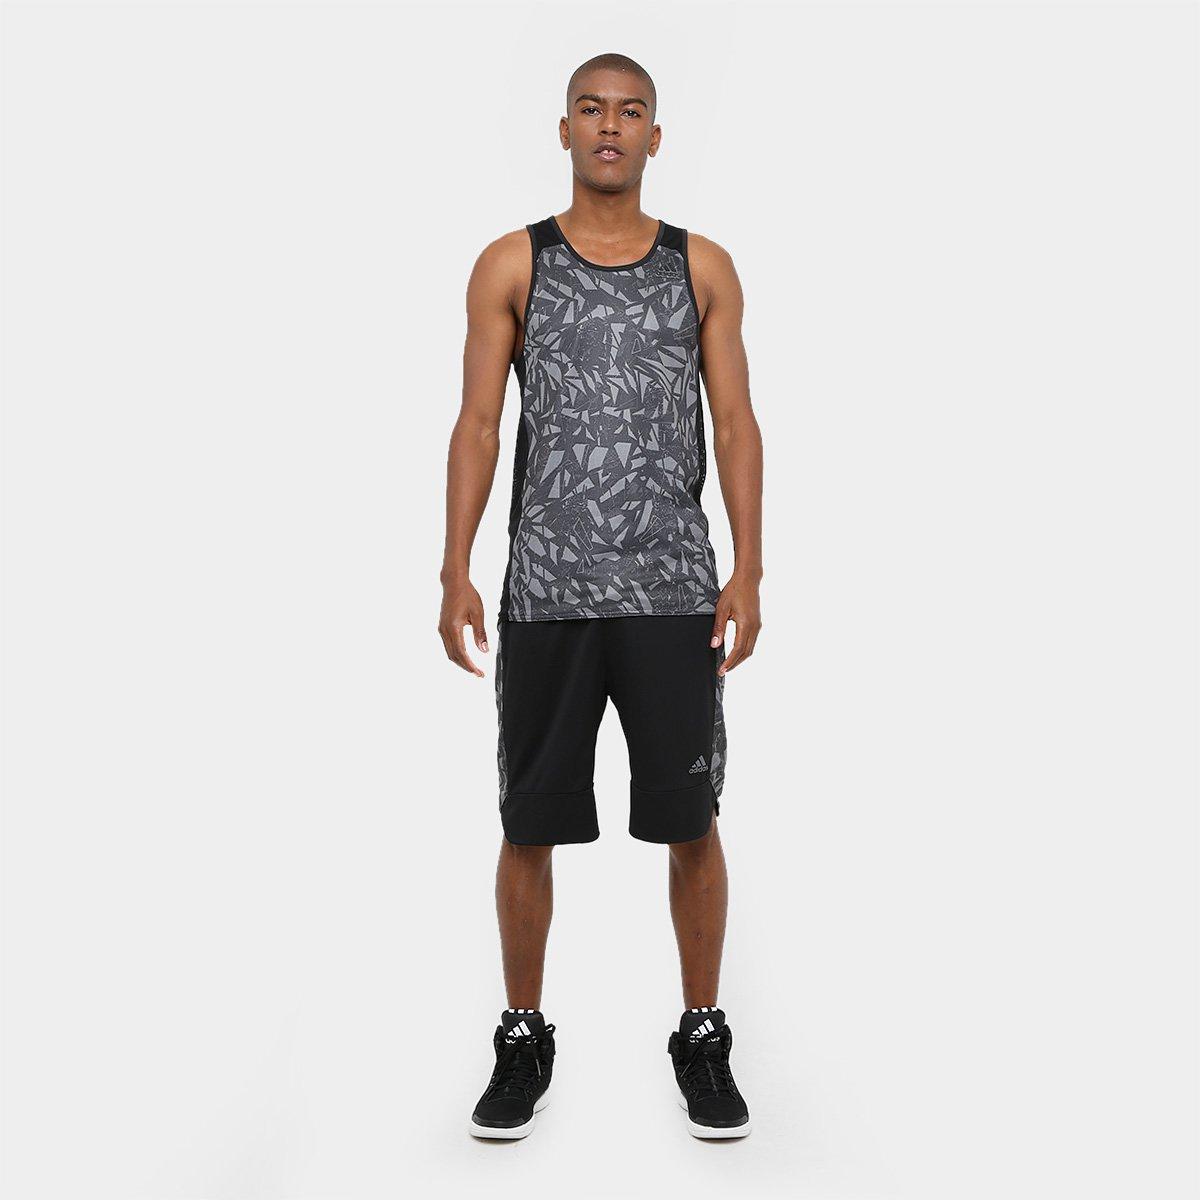 Camiseta Regata Adidas Essentials Masculina  5a120f4ef8088